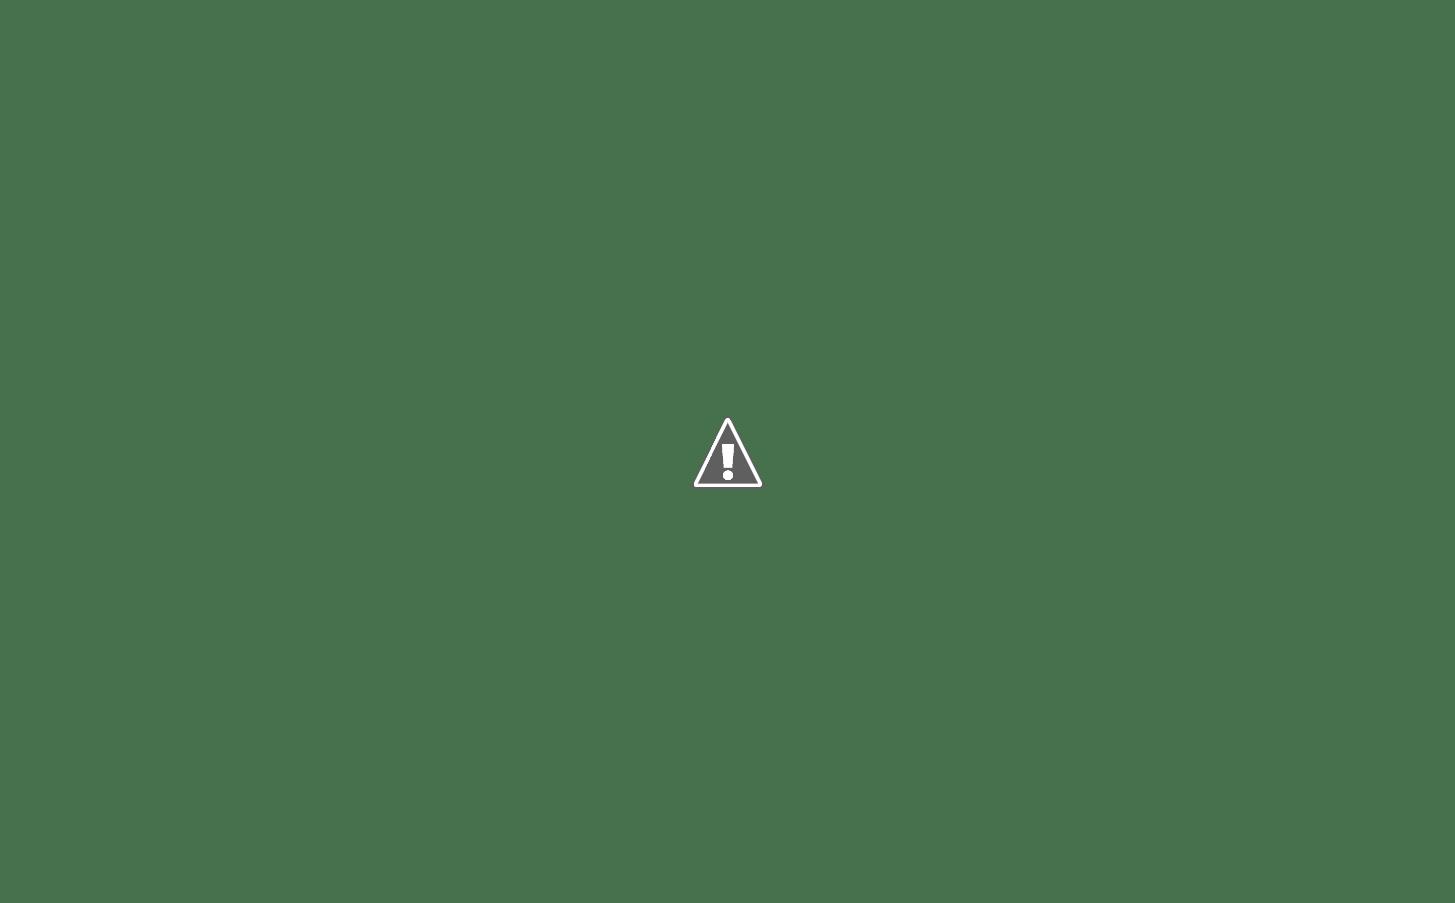 shoppingcart page to buy sweet potato